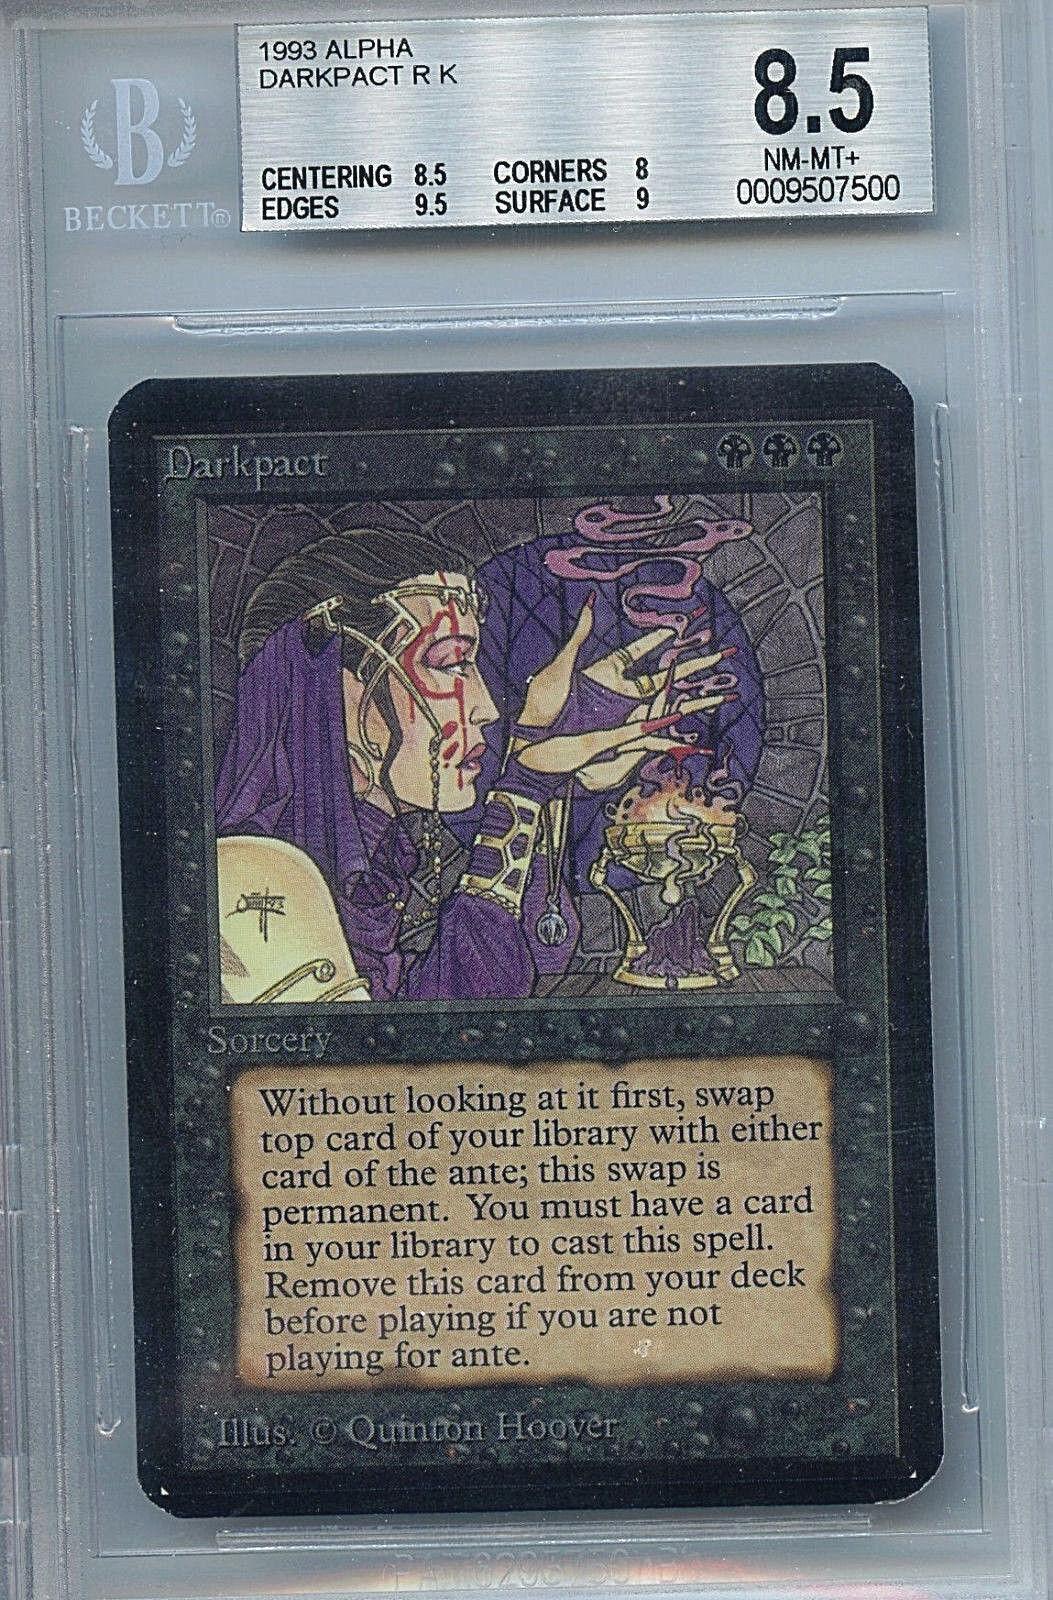 MTG Alpha Darkpact BGS 8.5 NM MT+ Card Magic the Gathering WOTC 7500